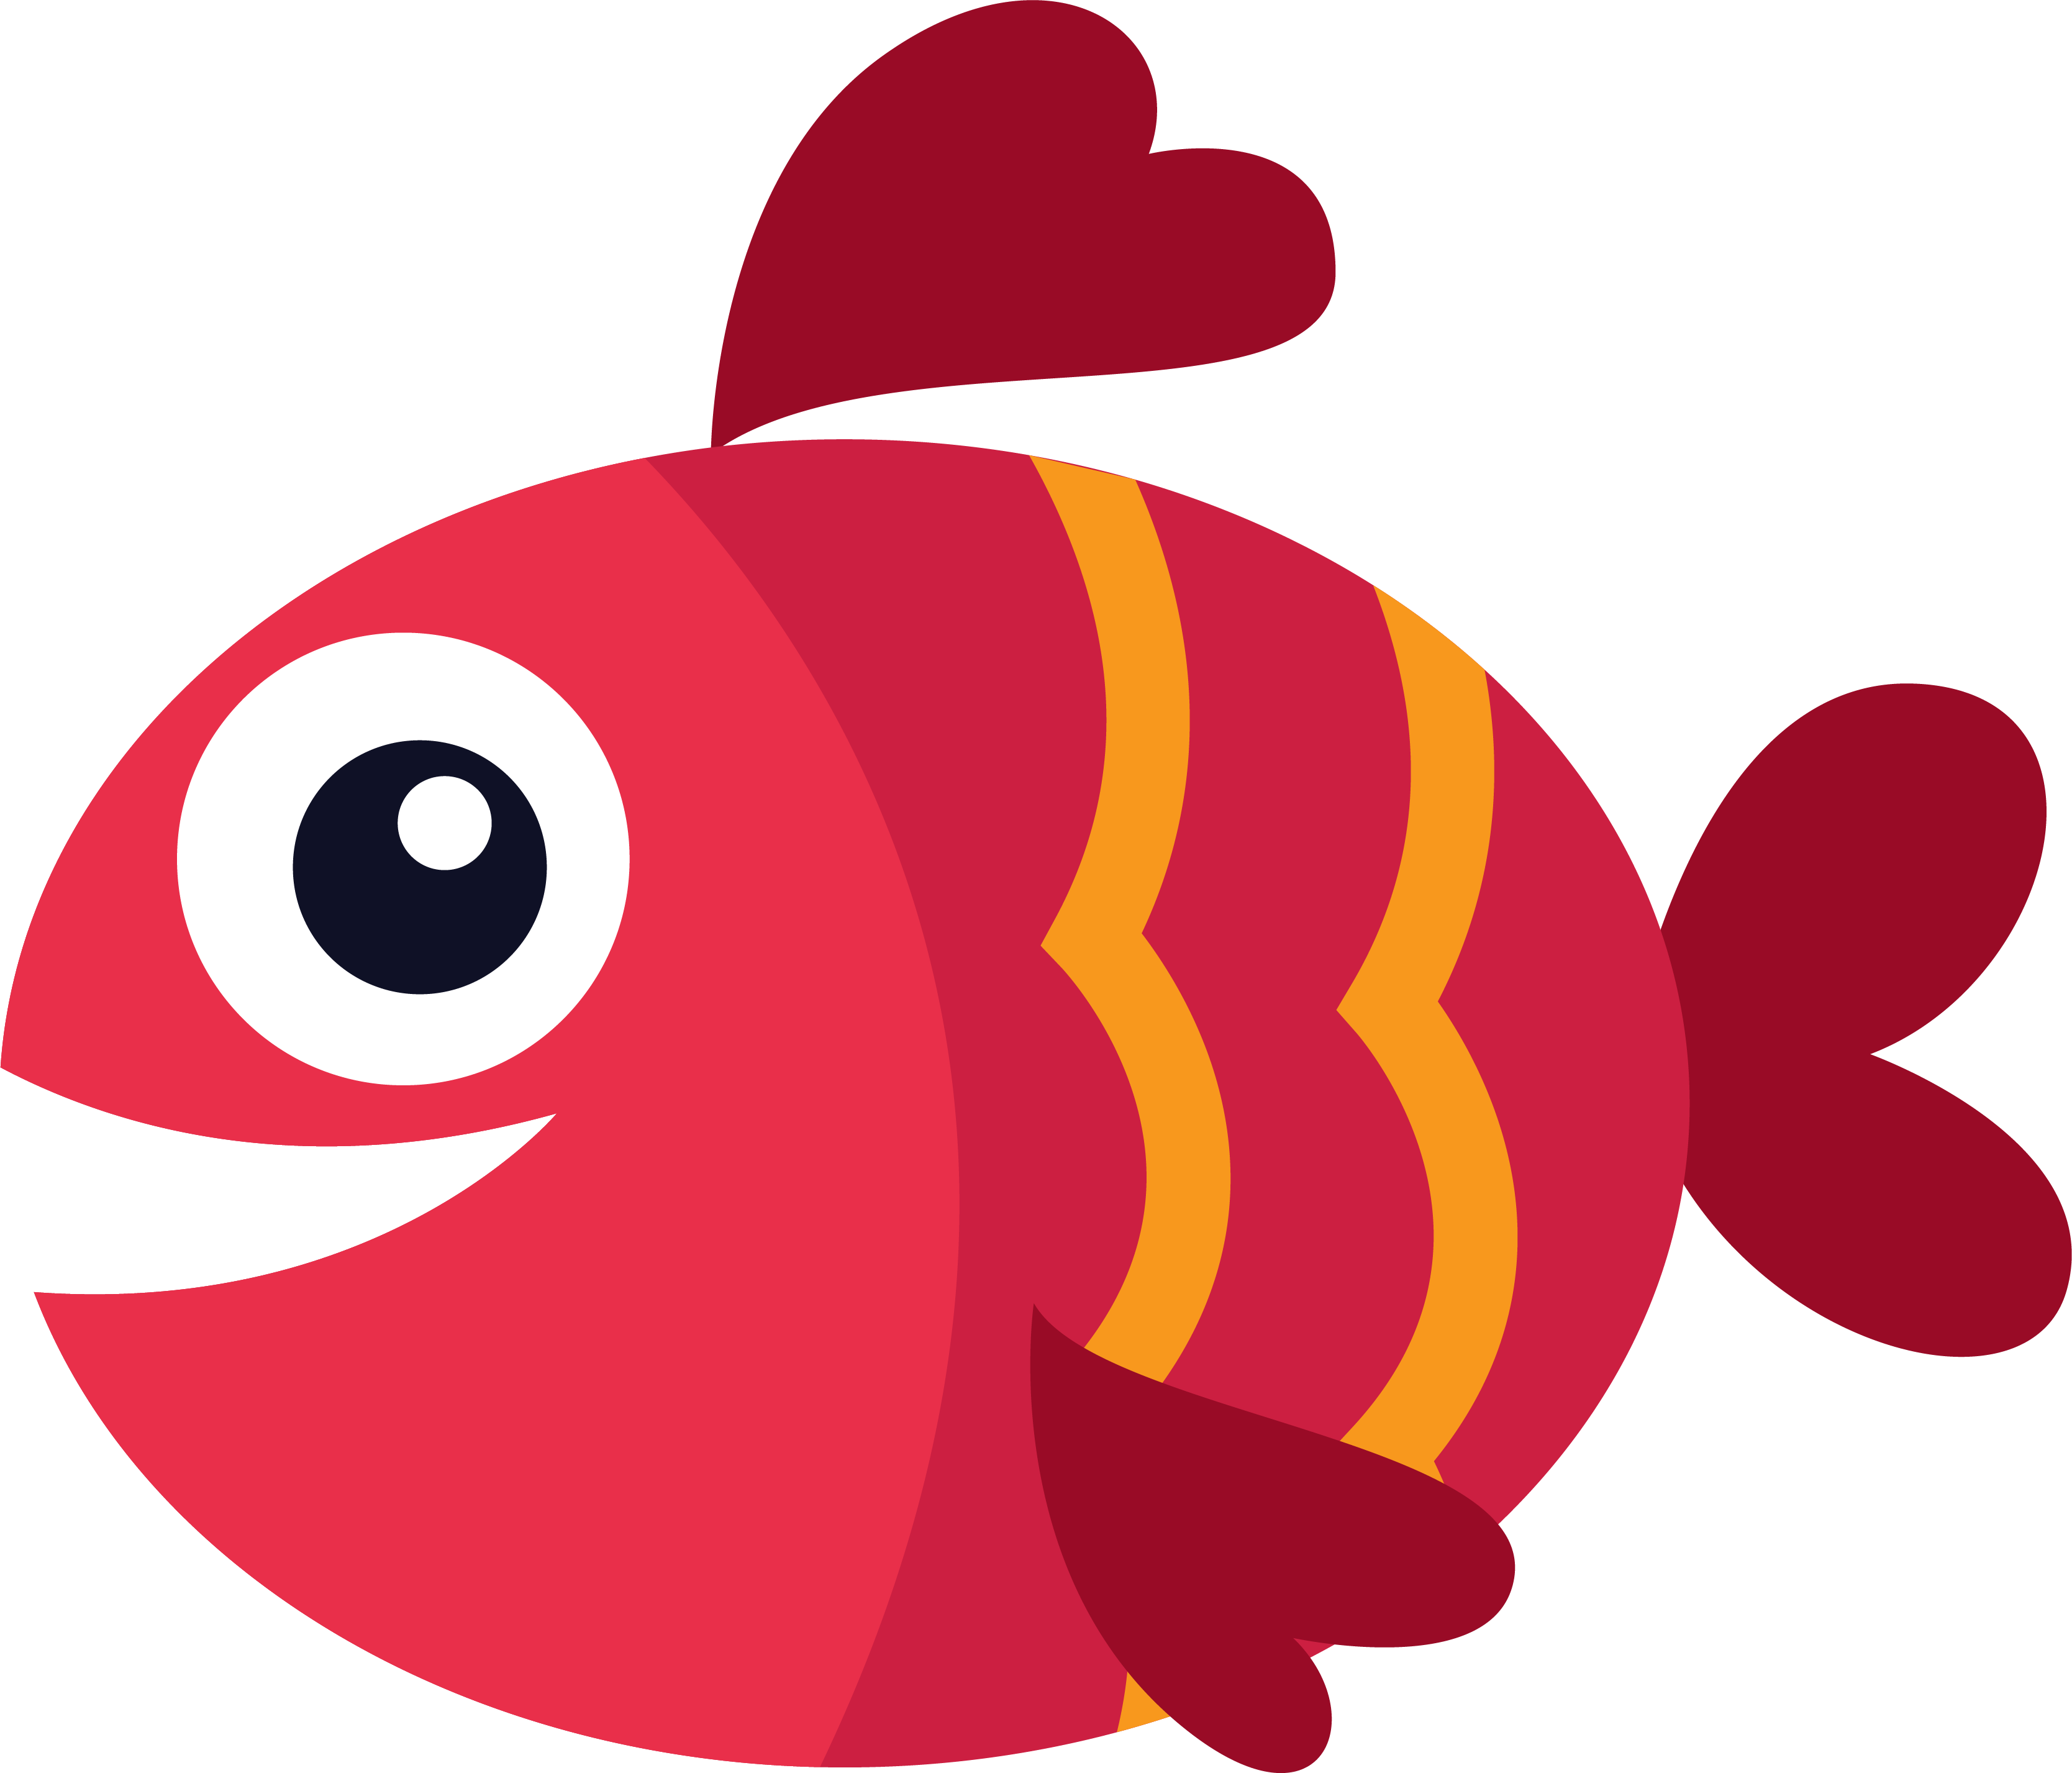 free printable fish clipart at getdrawings com free for personal rh getdrawings com cute fish clipart free funny fish clipart